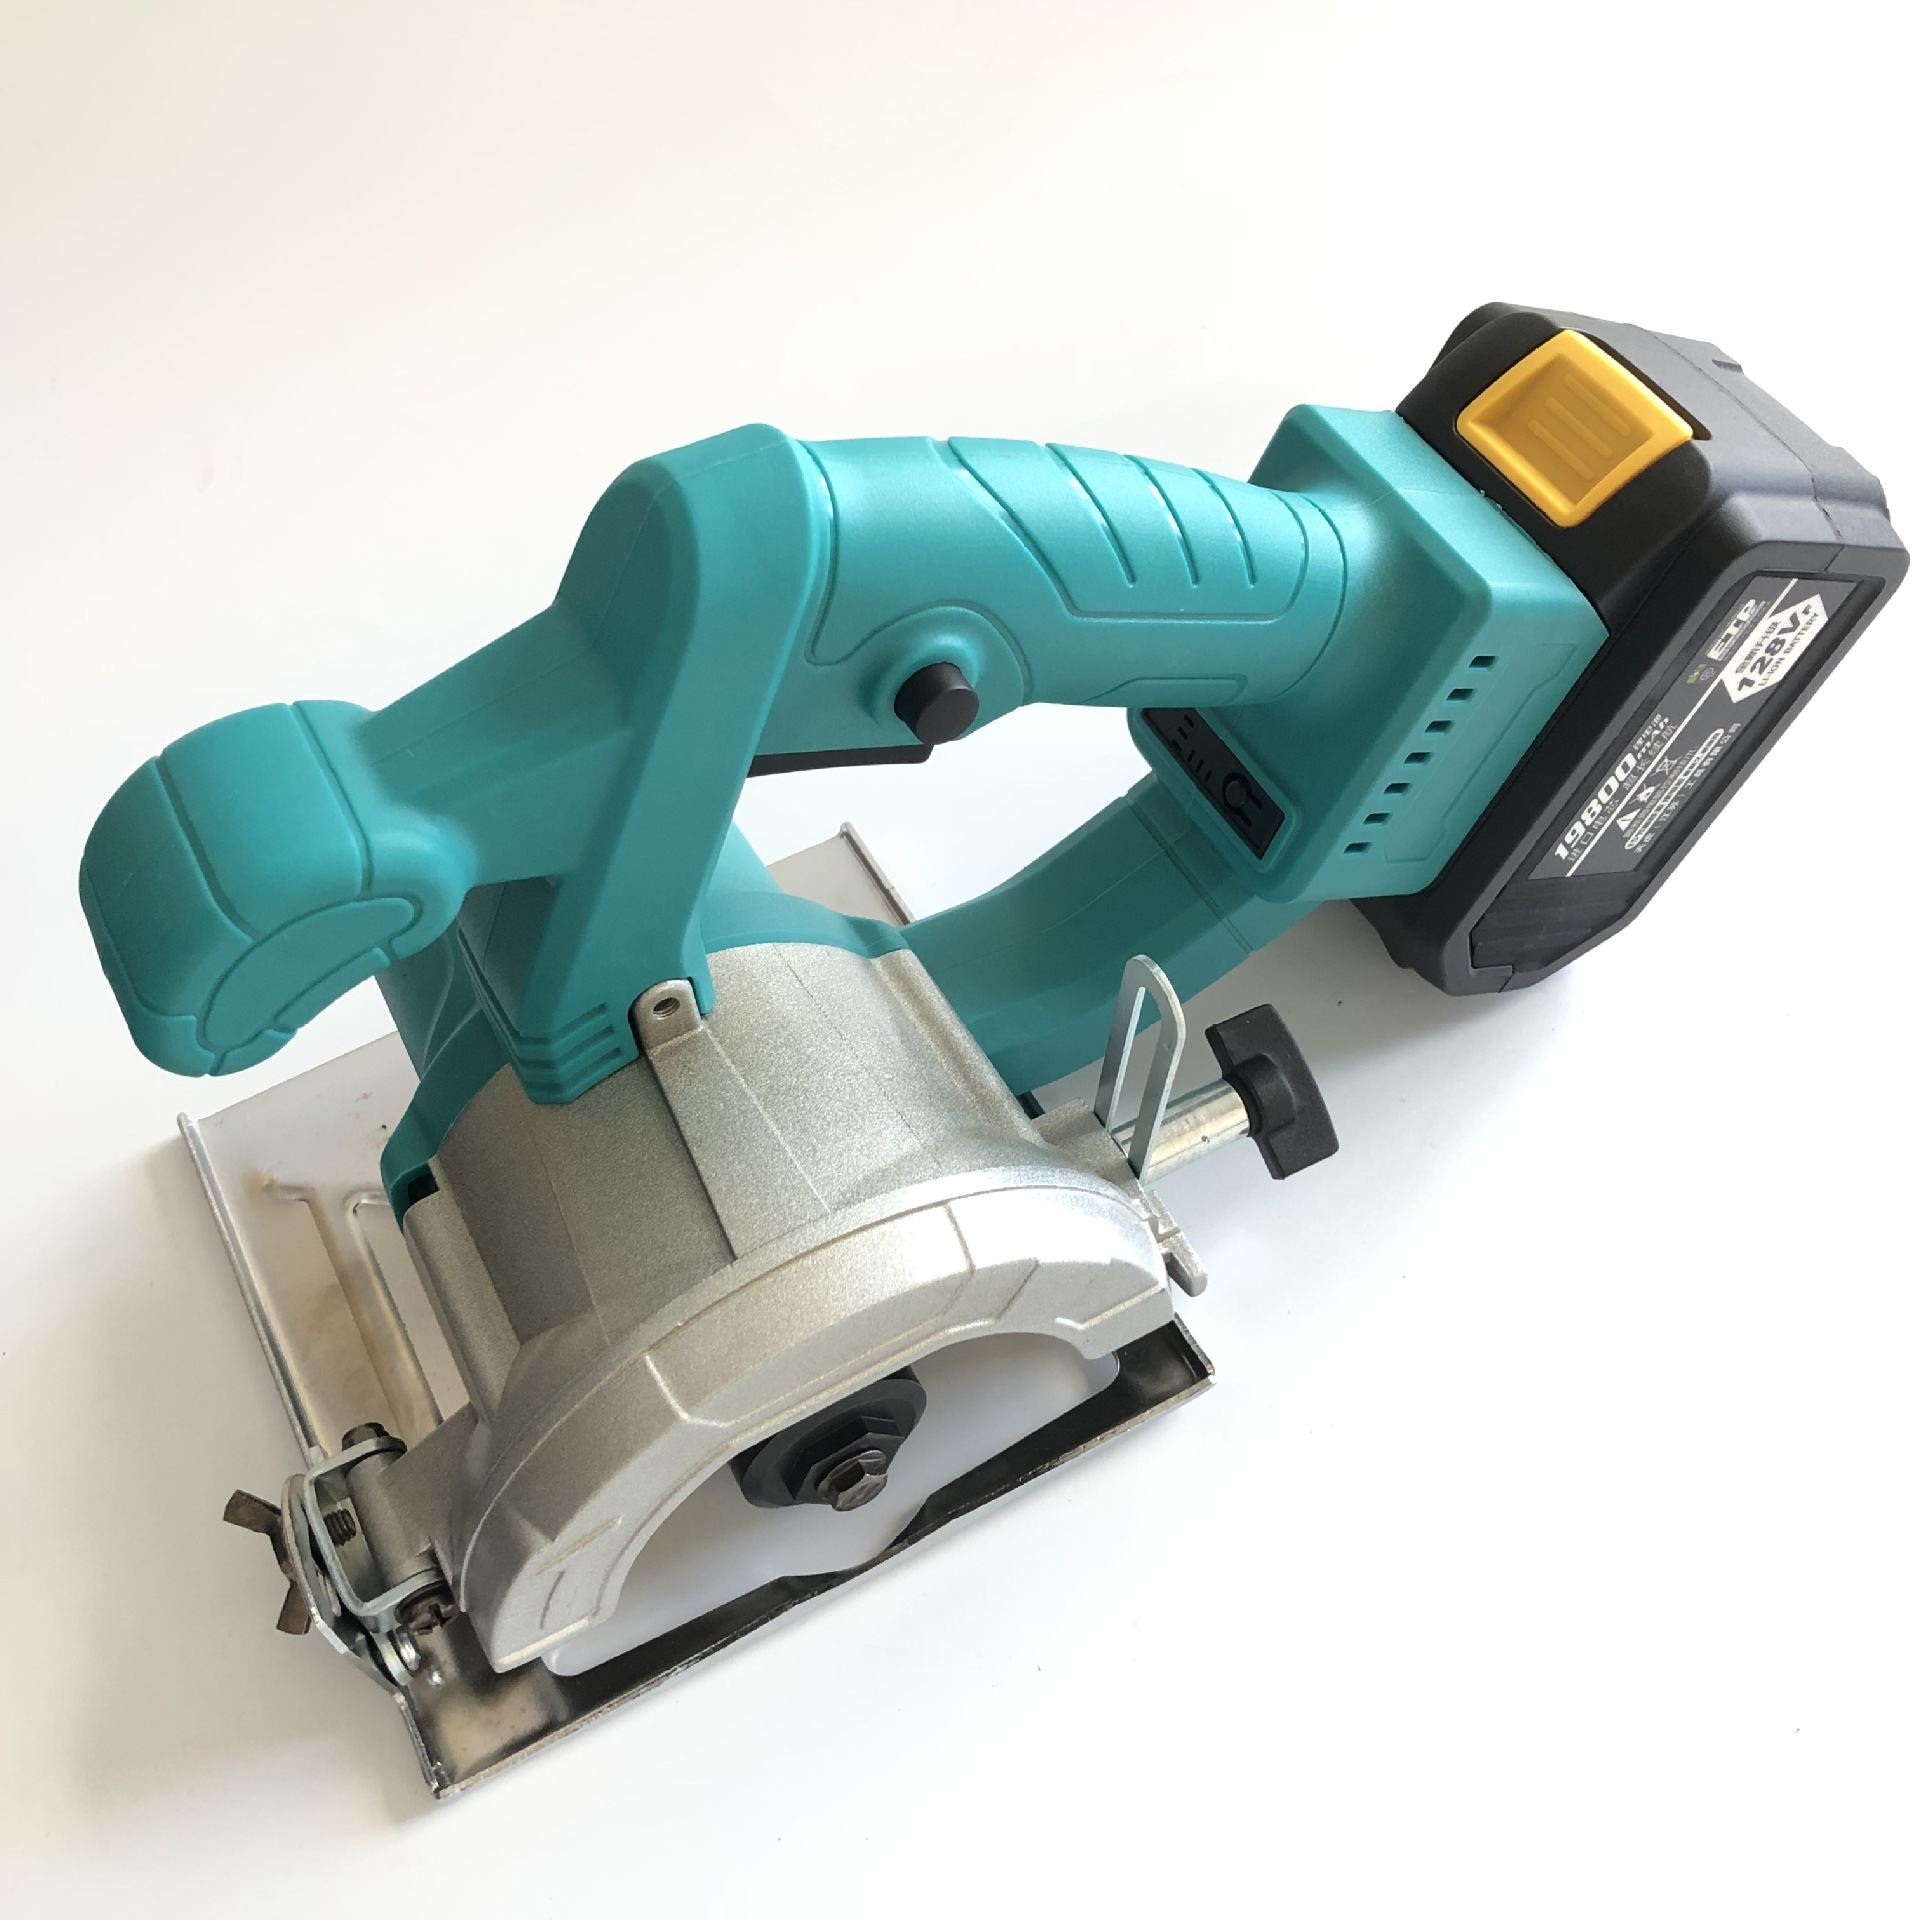 Li-ion Buzz-saw Cordless Electric Annular Saw Logging Ring Saw Metal Cutting Electric Circular Saw Ceramic Tile Cutting Machine